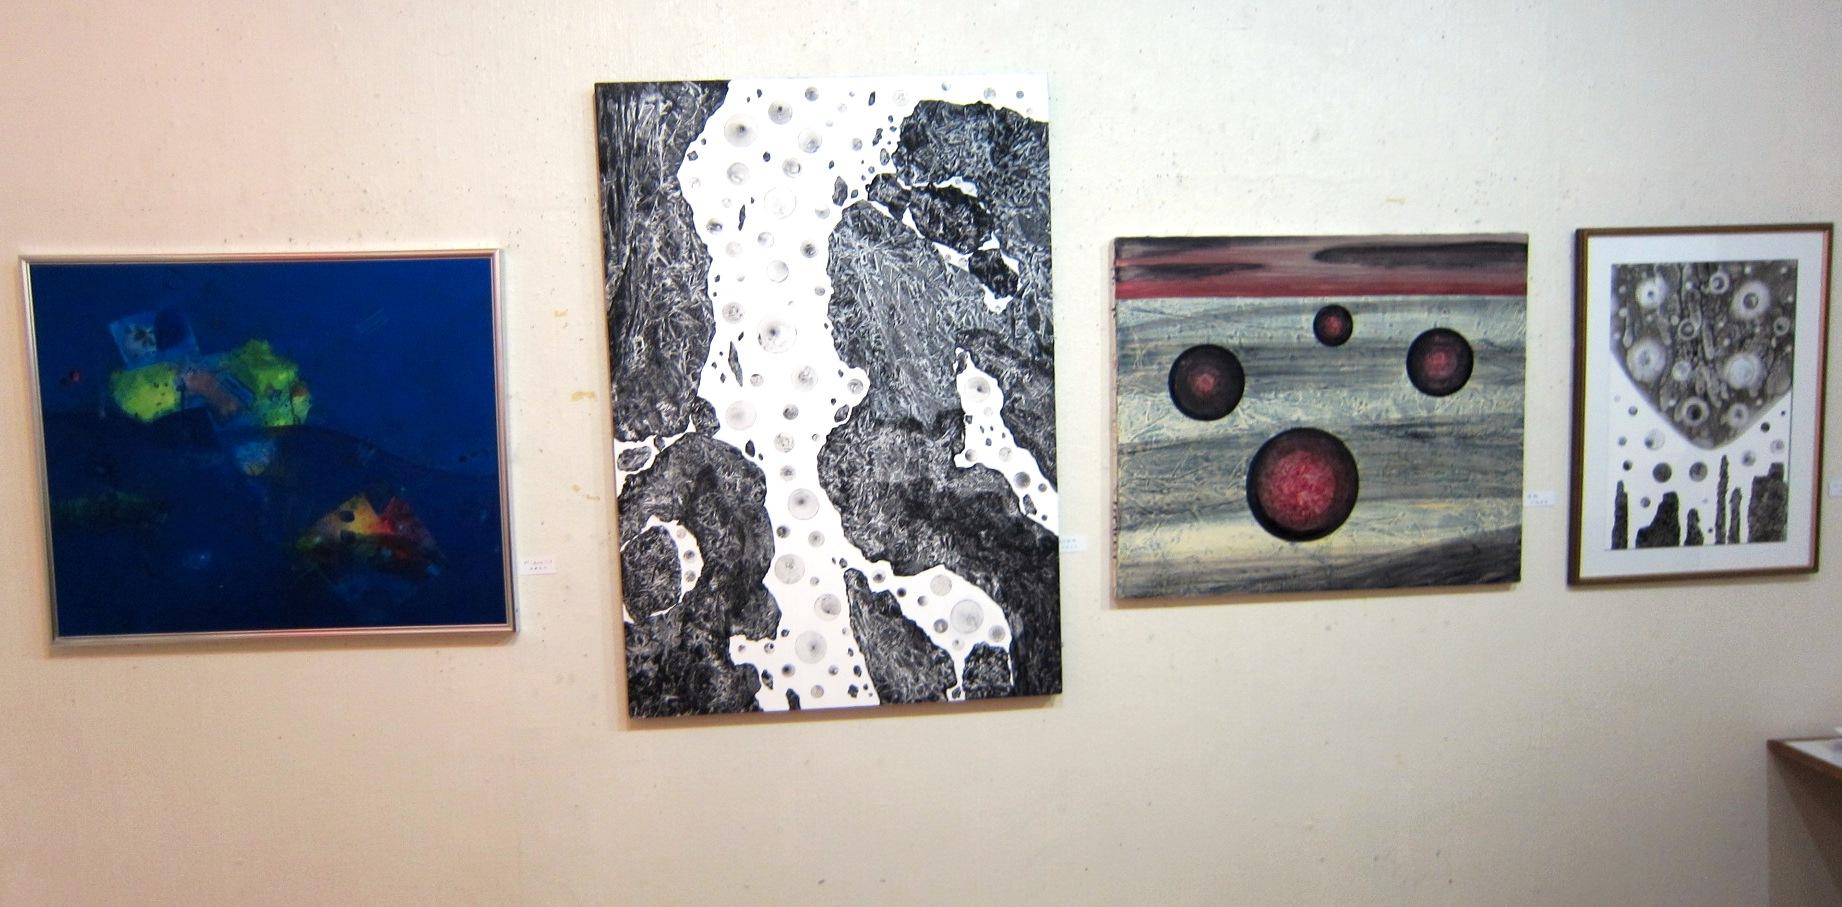 2354) 「LA`TAPIO -Ⅱ- Exhibition」 たぴお 1月27日(月)~2月15日(土)_f0126829_940316.jpg